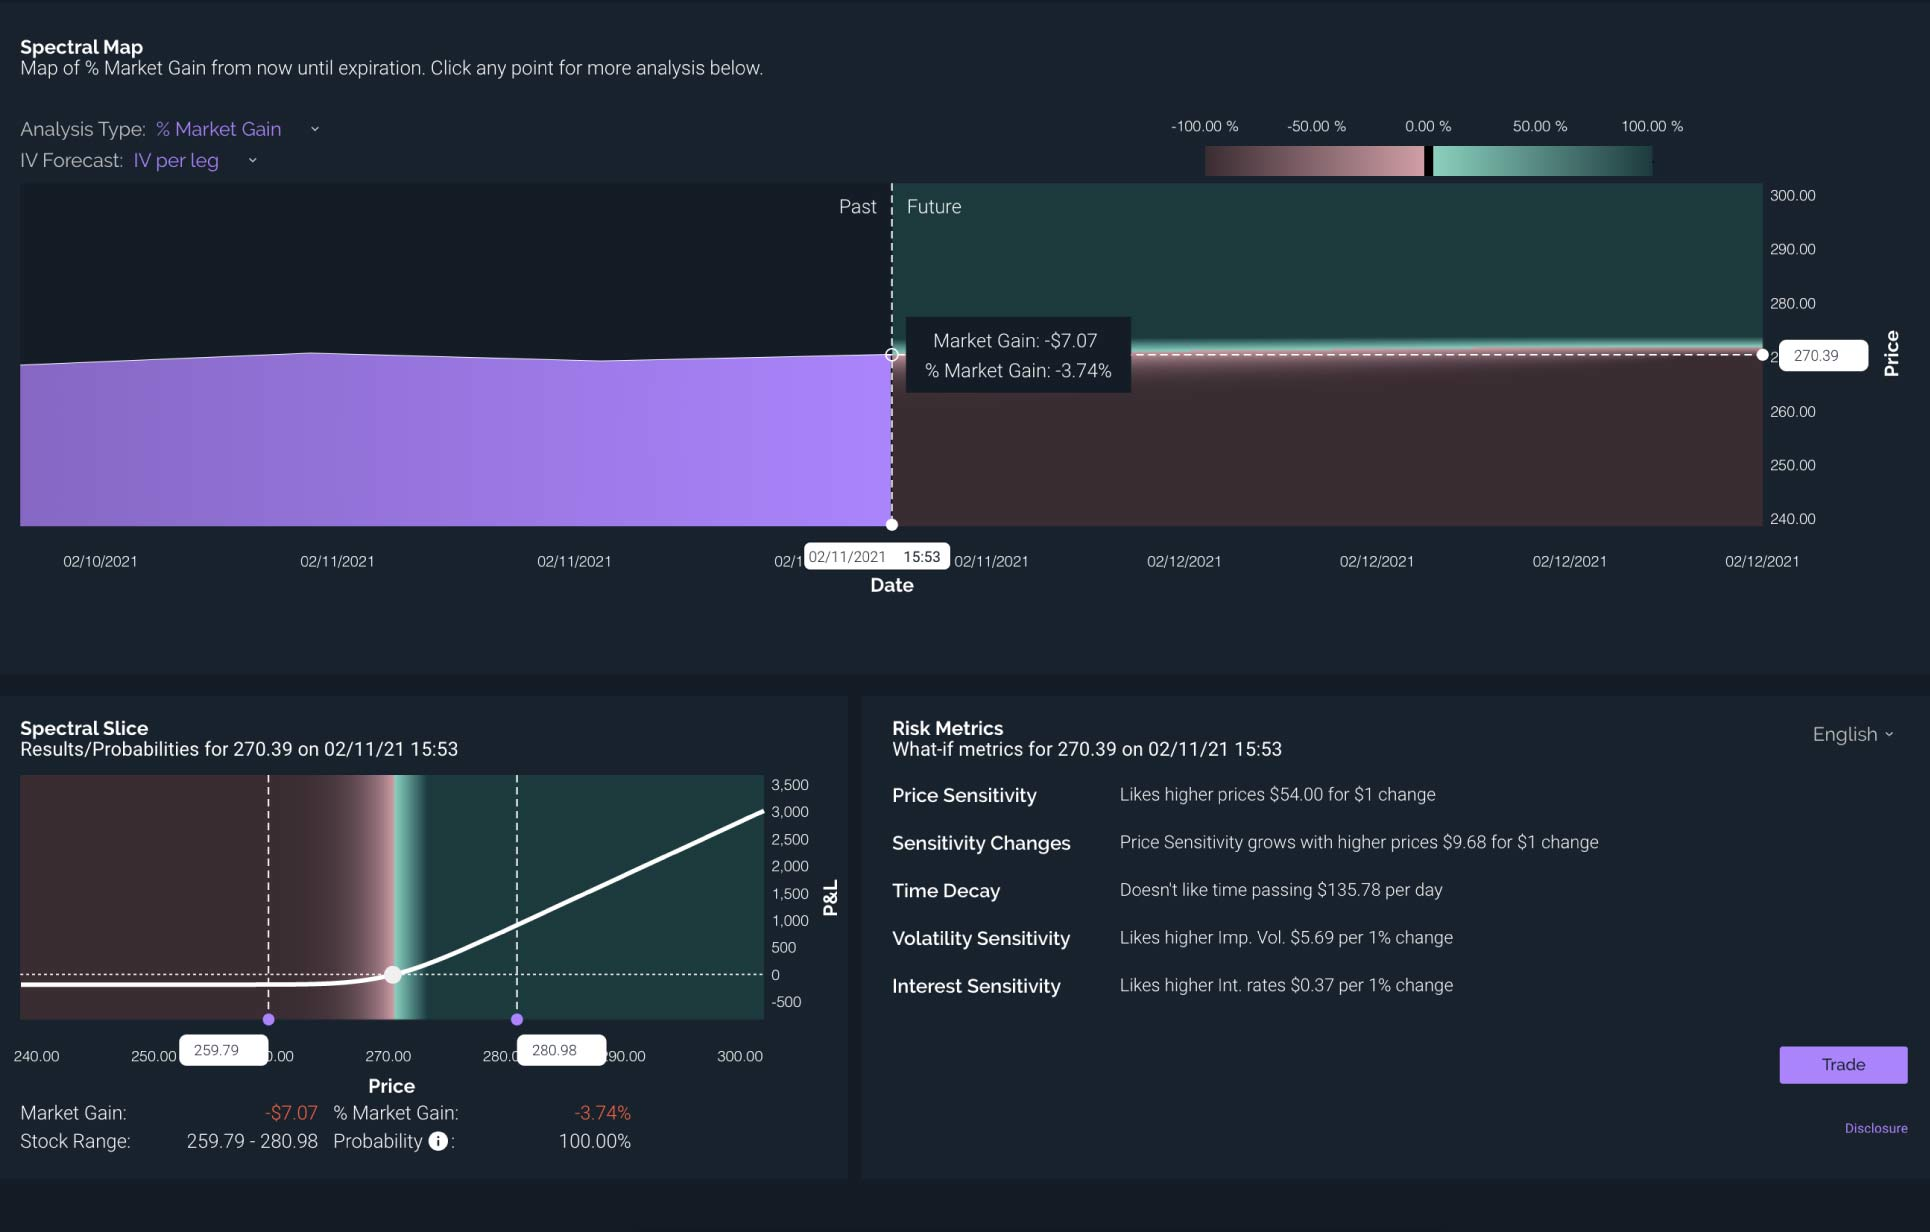 Screenshot of spectral analysis